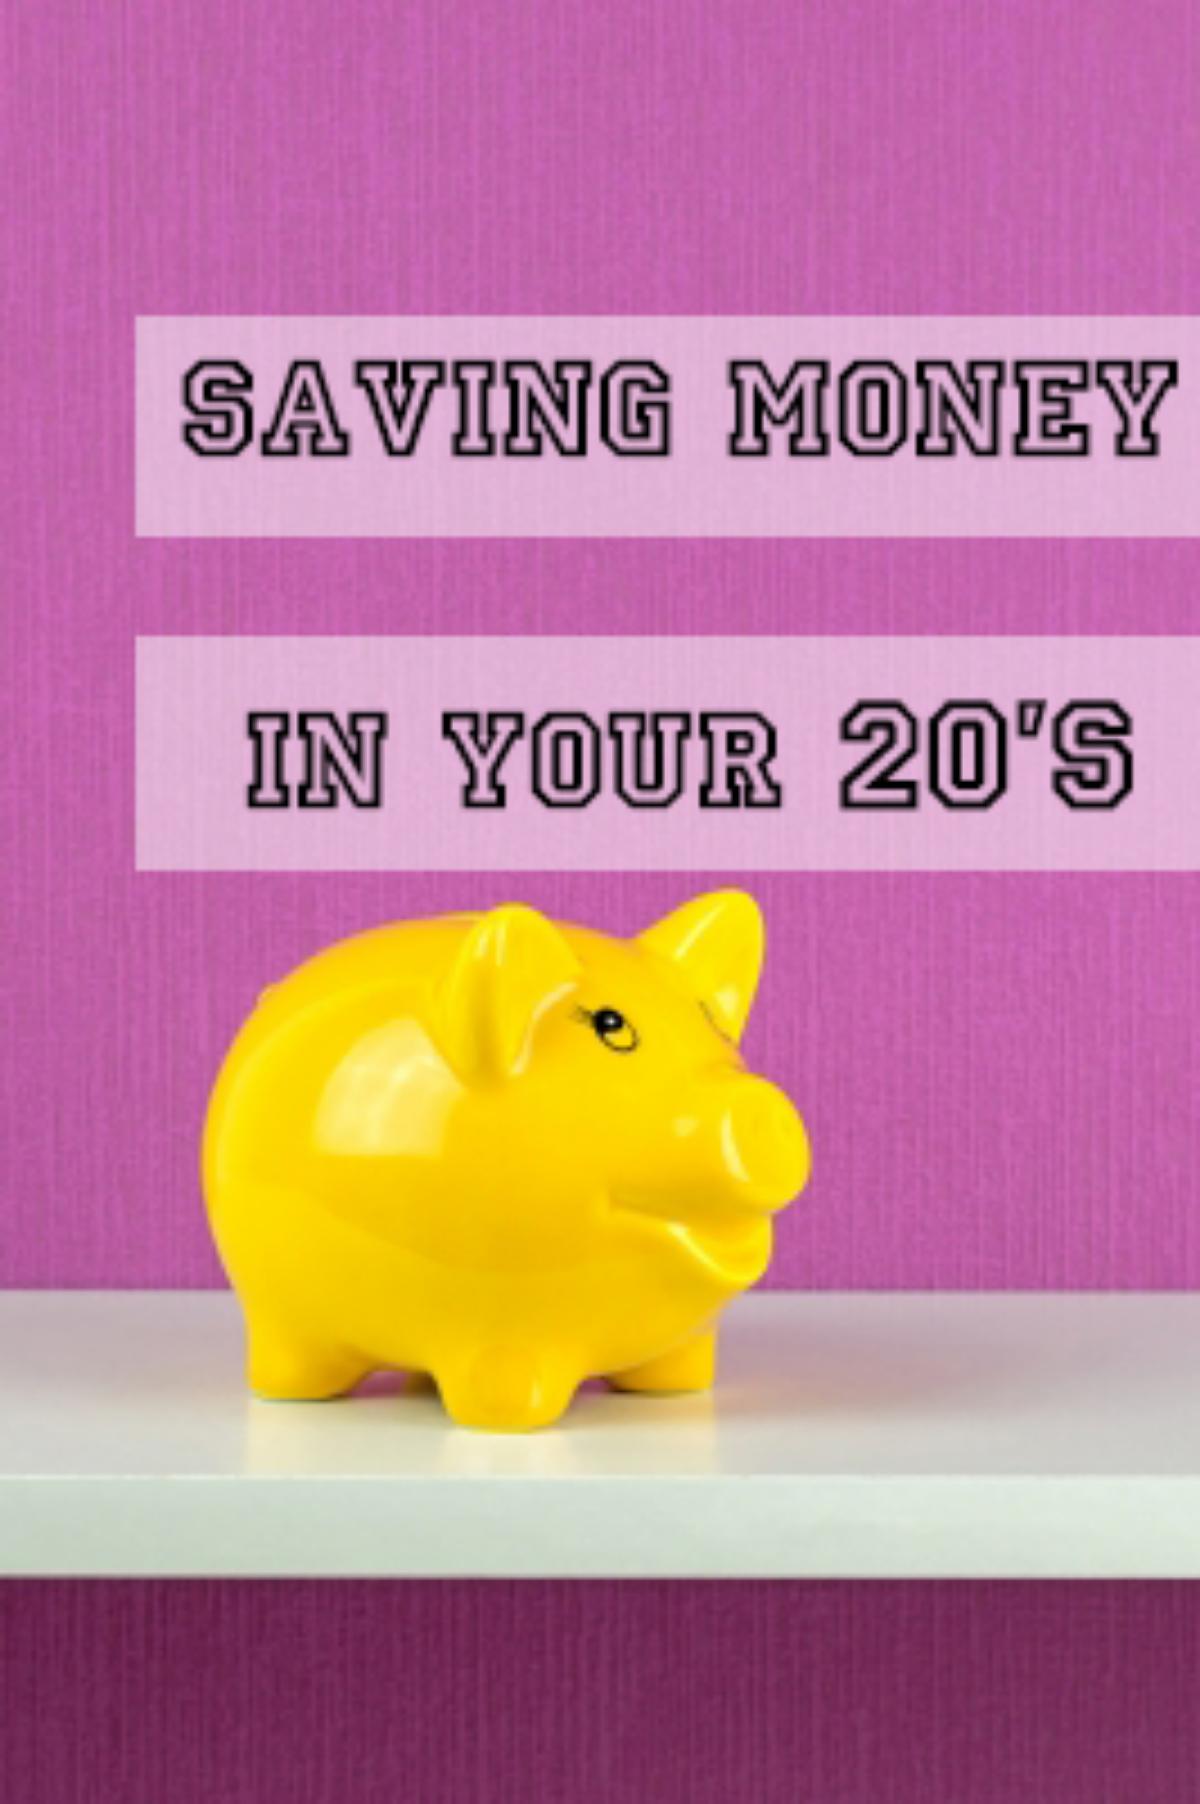 savingmoney.jpg